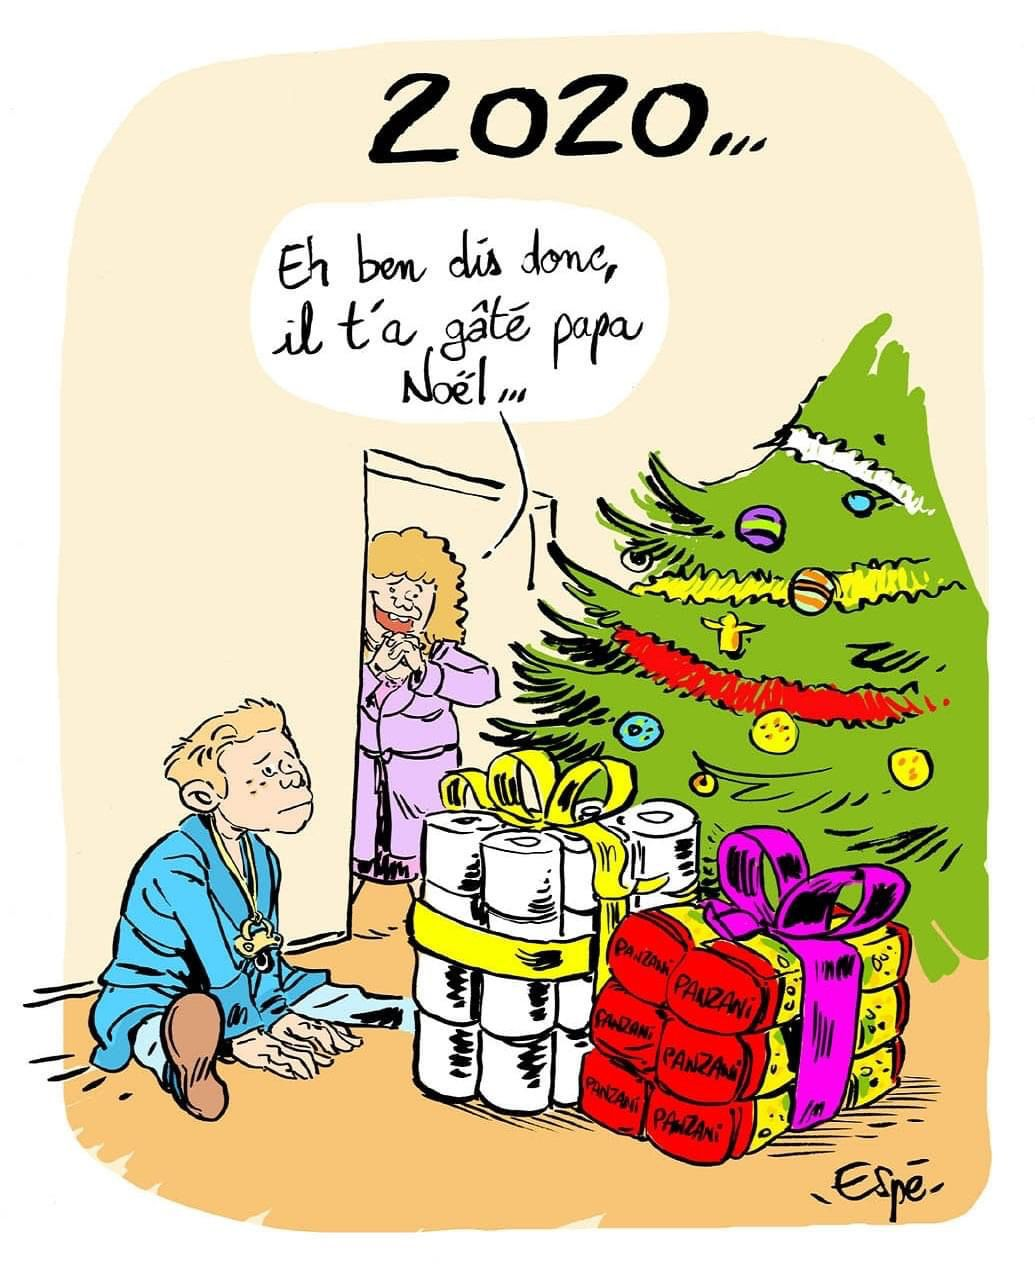 KIT de Noël